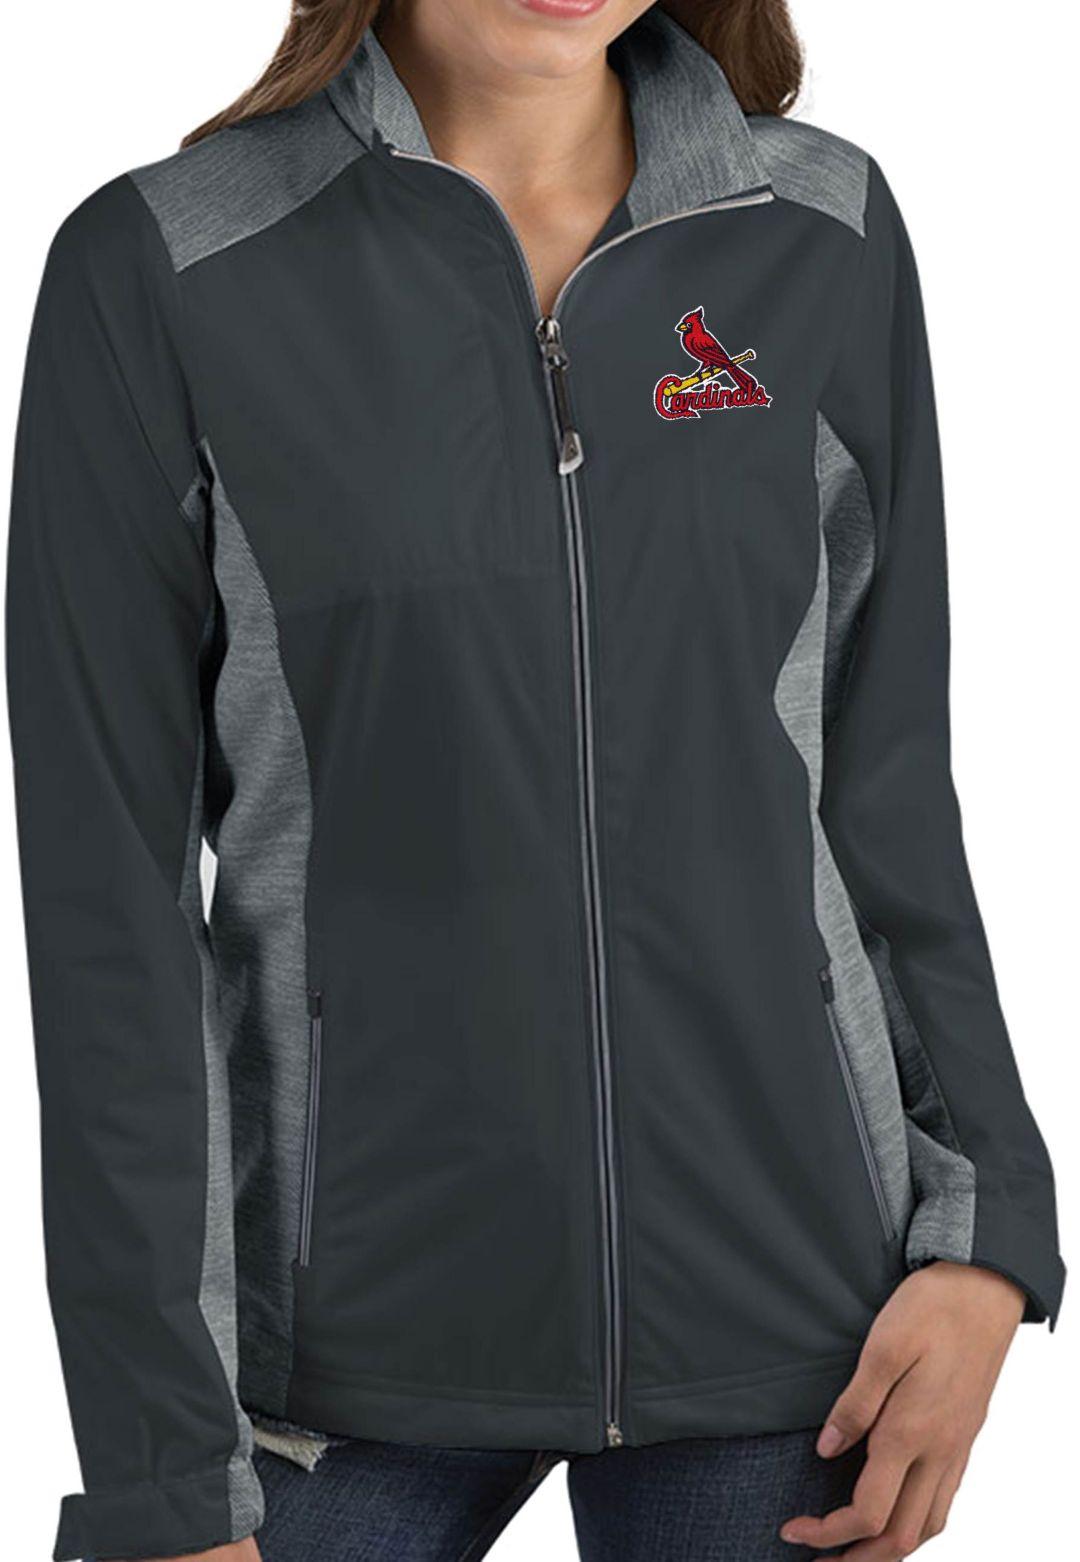 wholesale dealer b93ad d6bd7 Antigua Women's St. Louis Cardinals Revolve Grey Full-Zip Jacket